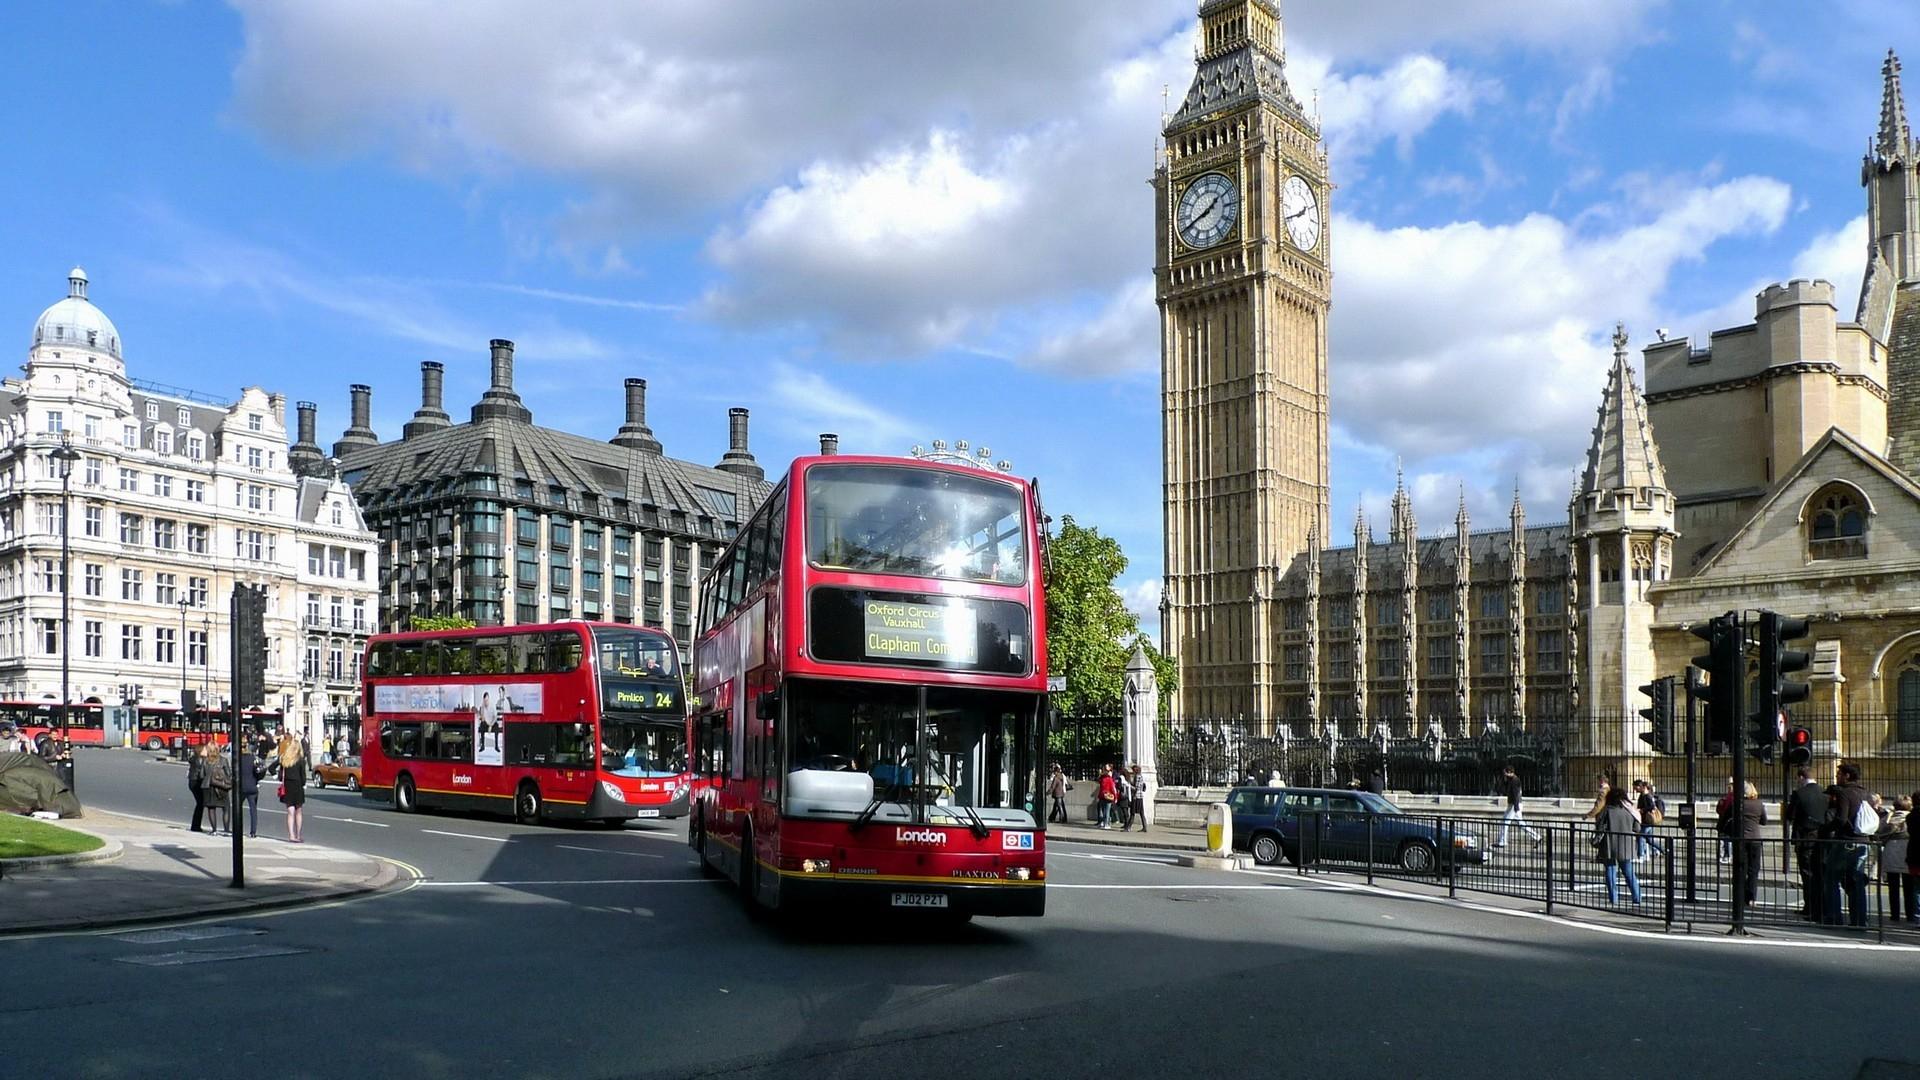 wallpaper : england, london, united kingdom, street 1920x1080